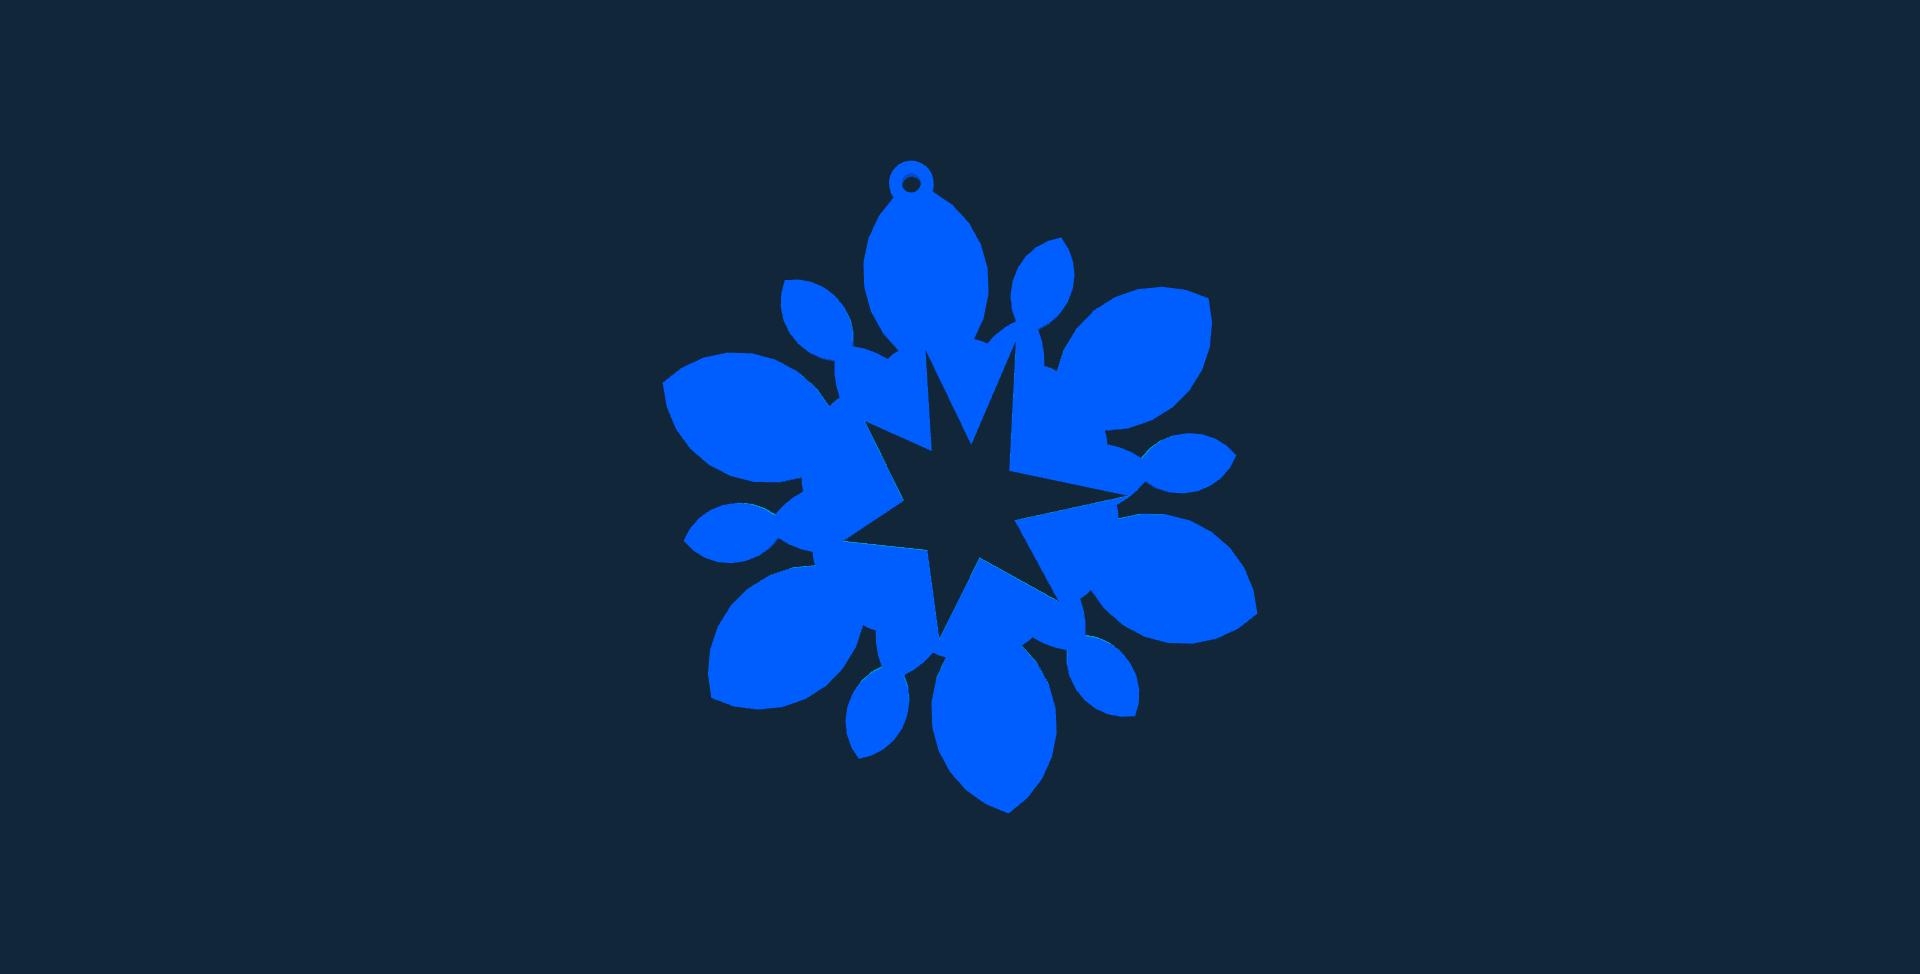 Snowflake design 6 stl file